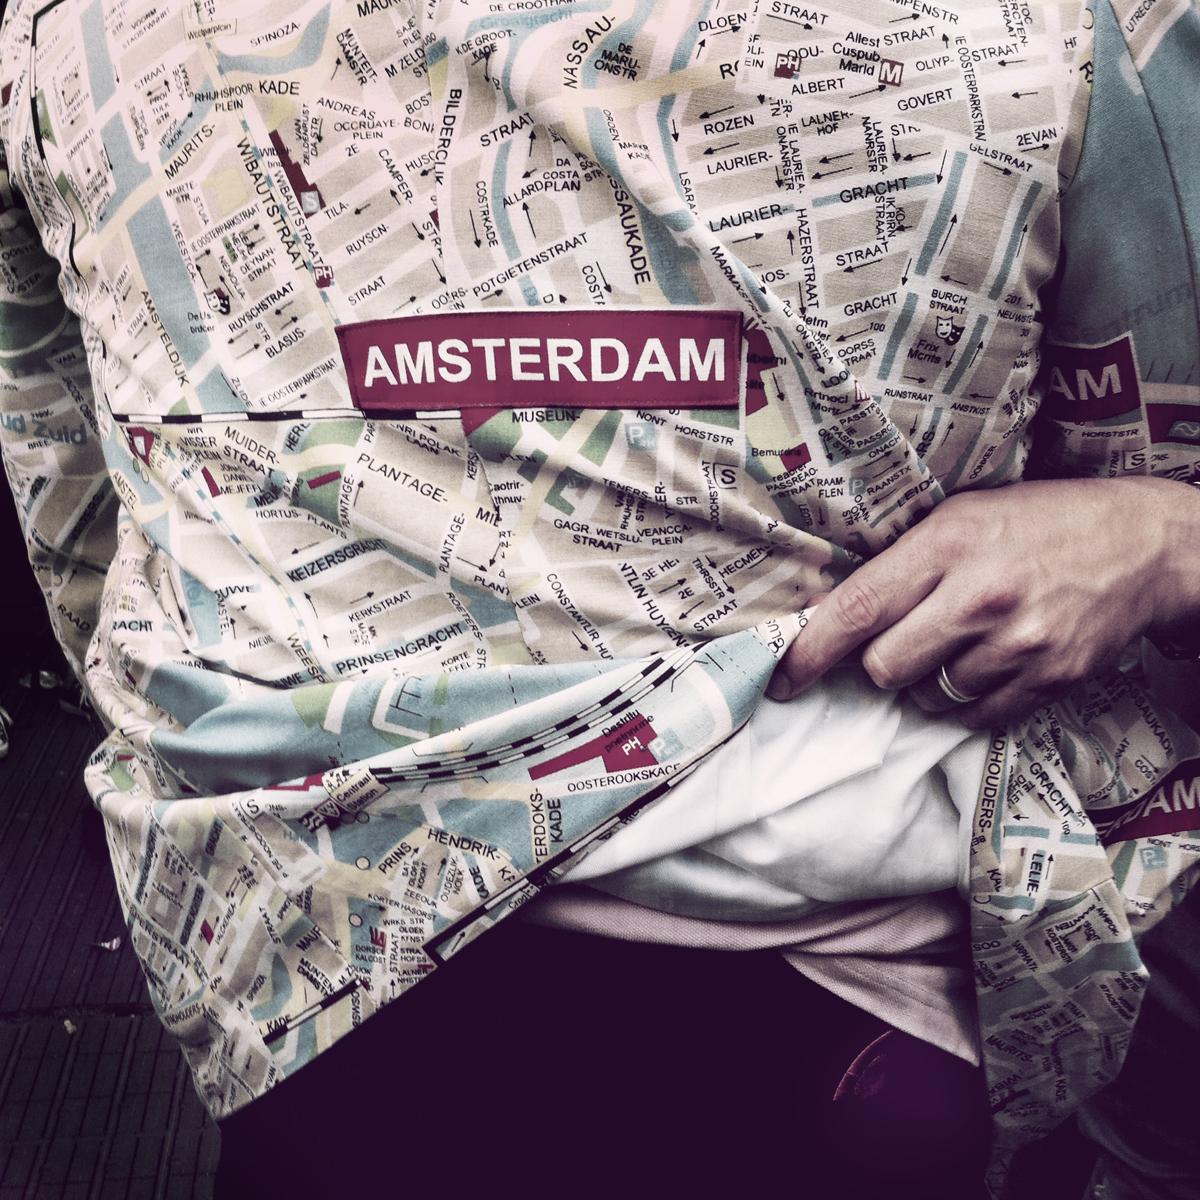 amsterdam_gp1.jpg